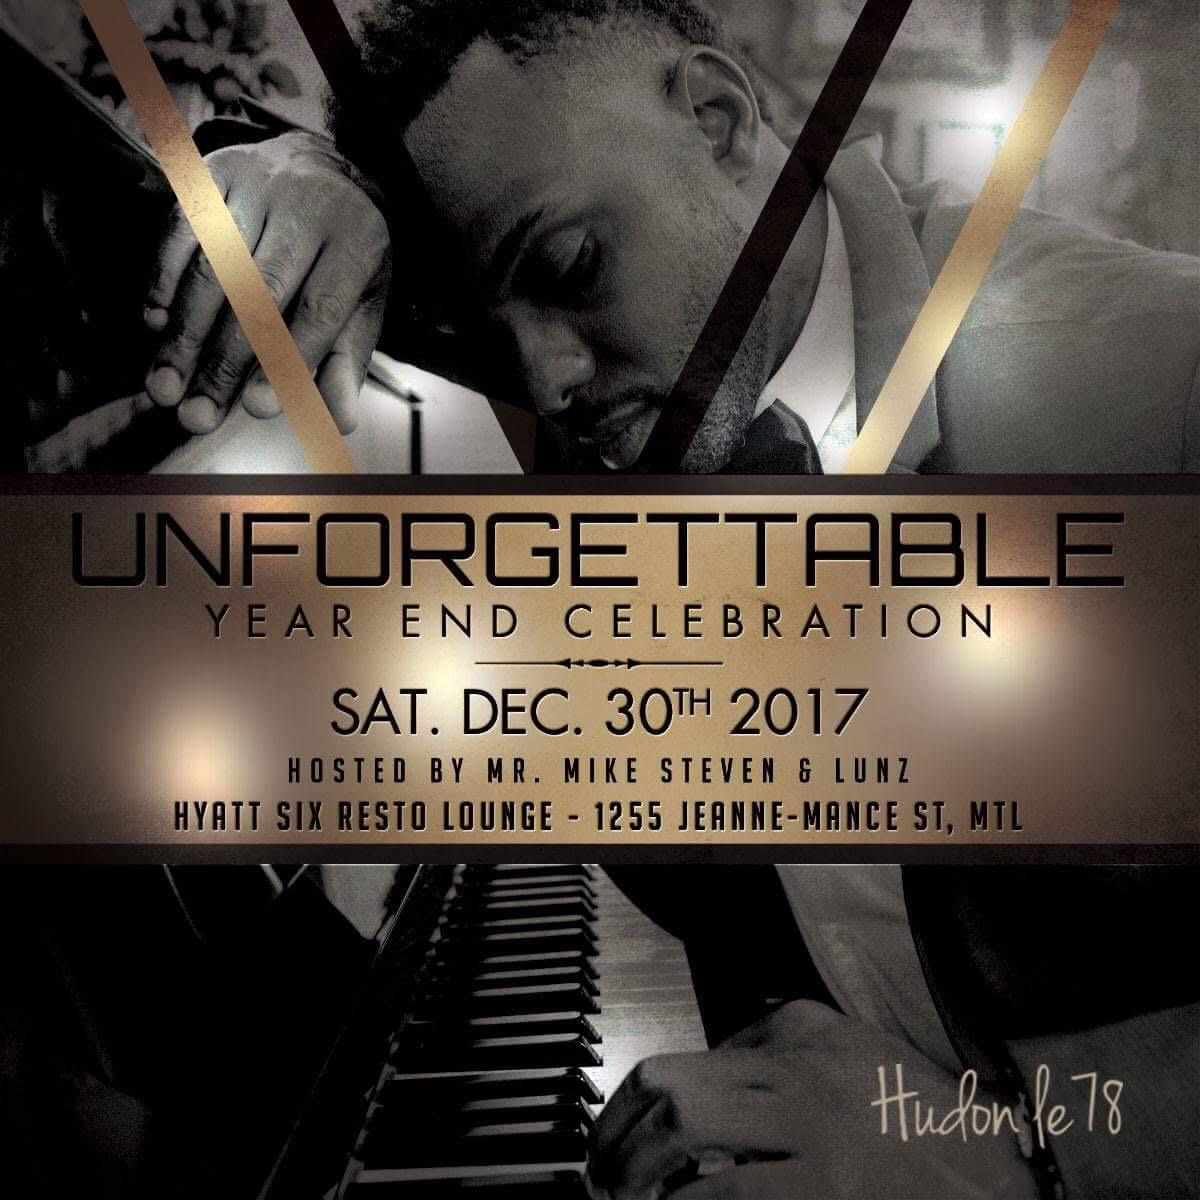 Unforgettable at Hyatt Six Resto Lounge Hudon Le 78